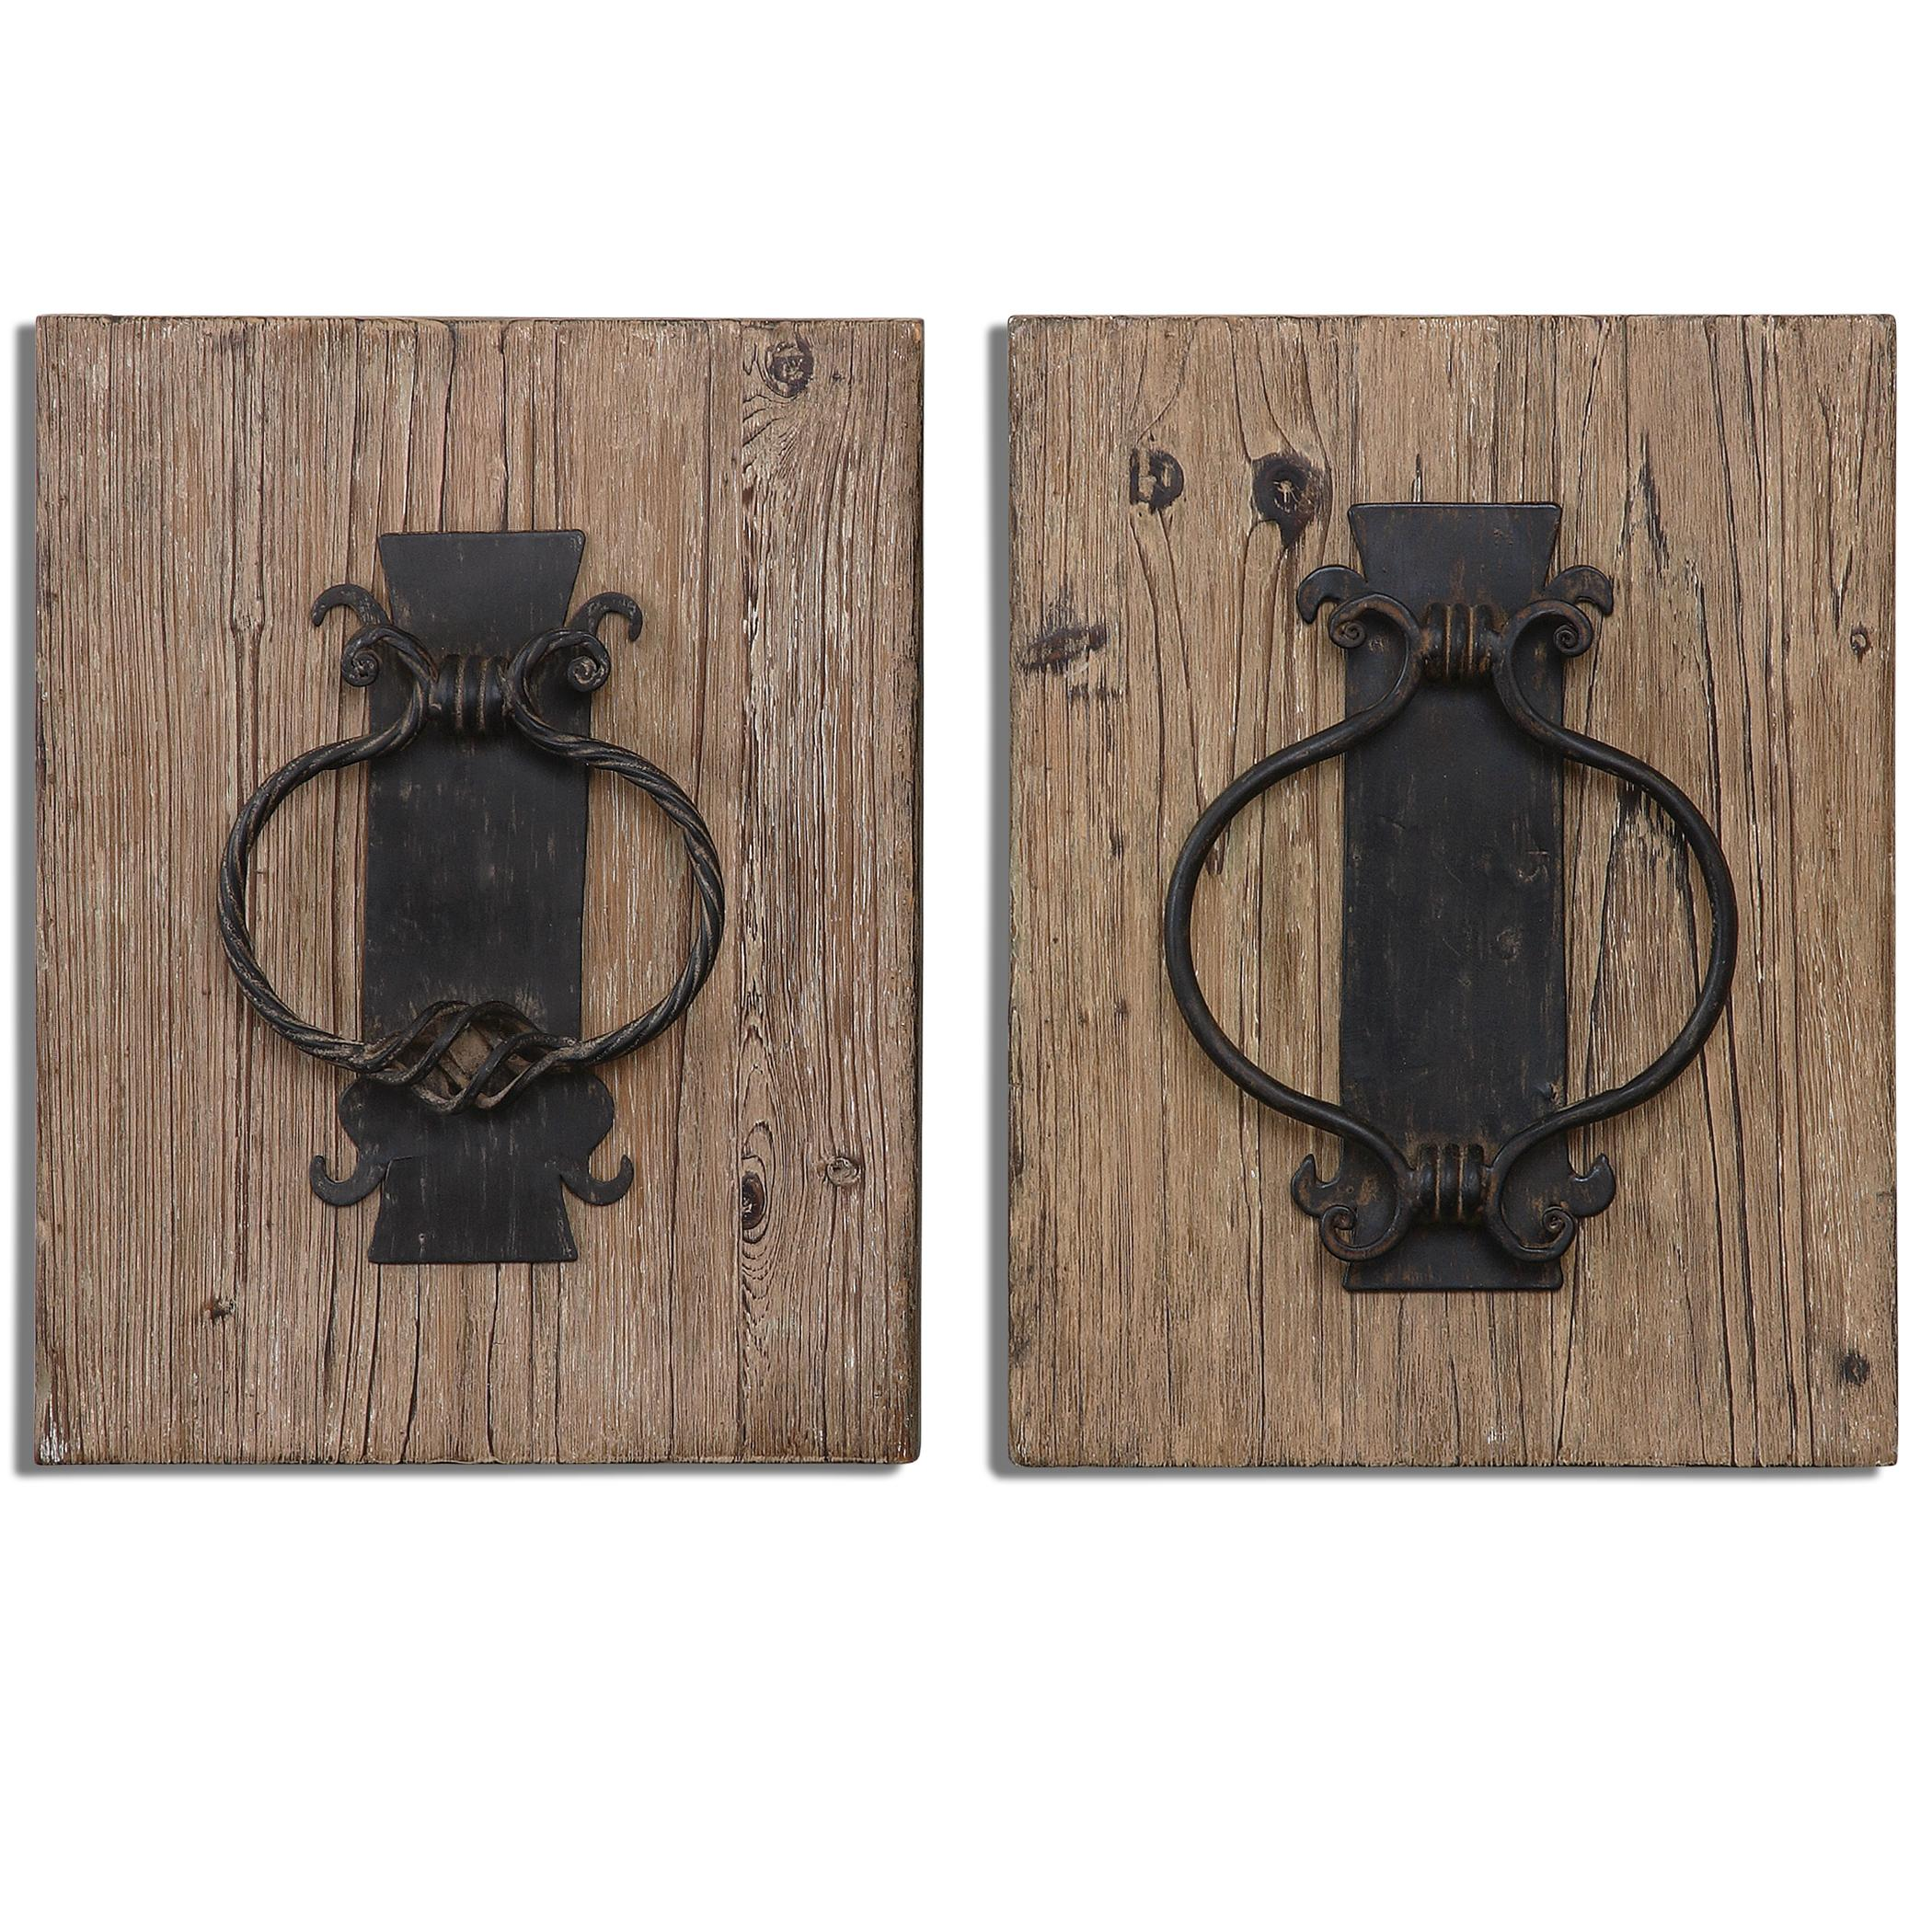 Uttermost Alternative Wall Decor Rustic Door Knockers Wall Art, Set of  2 - Item Number: 07654